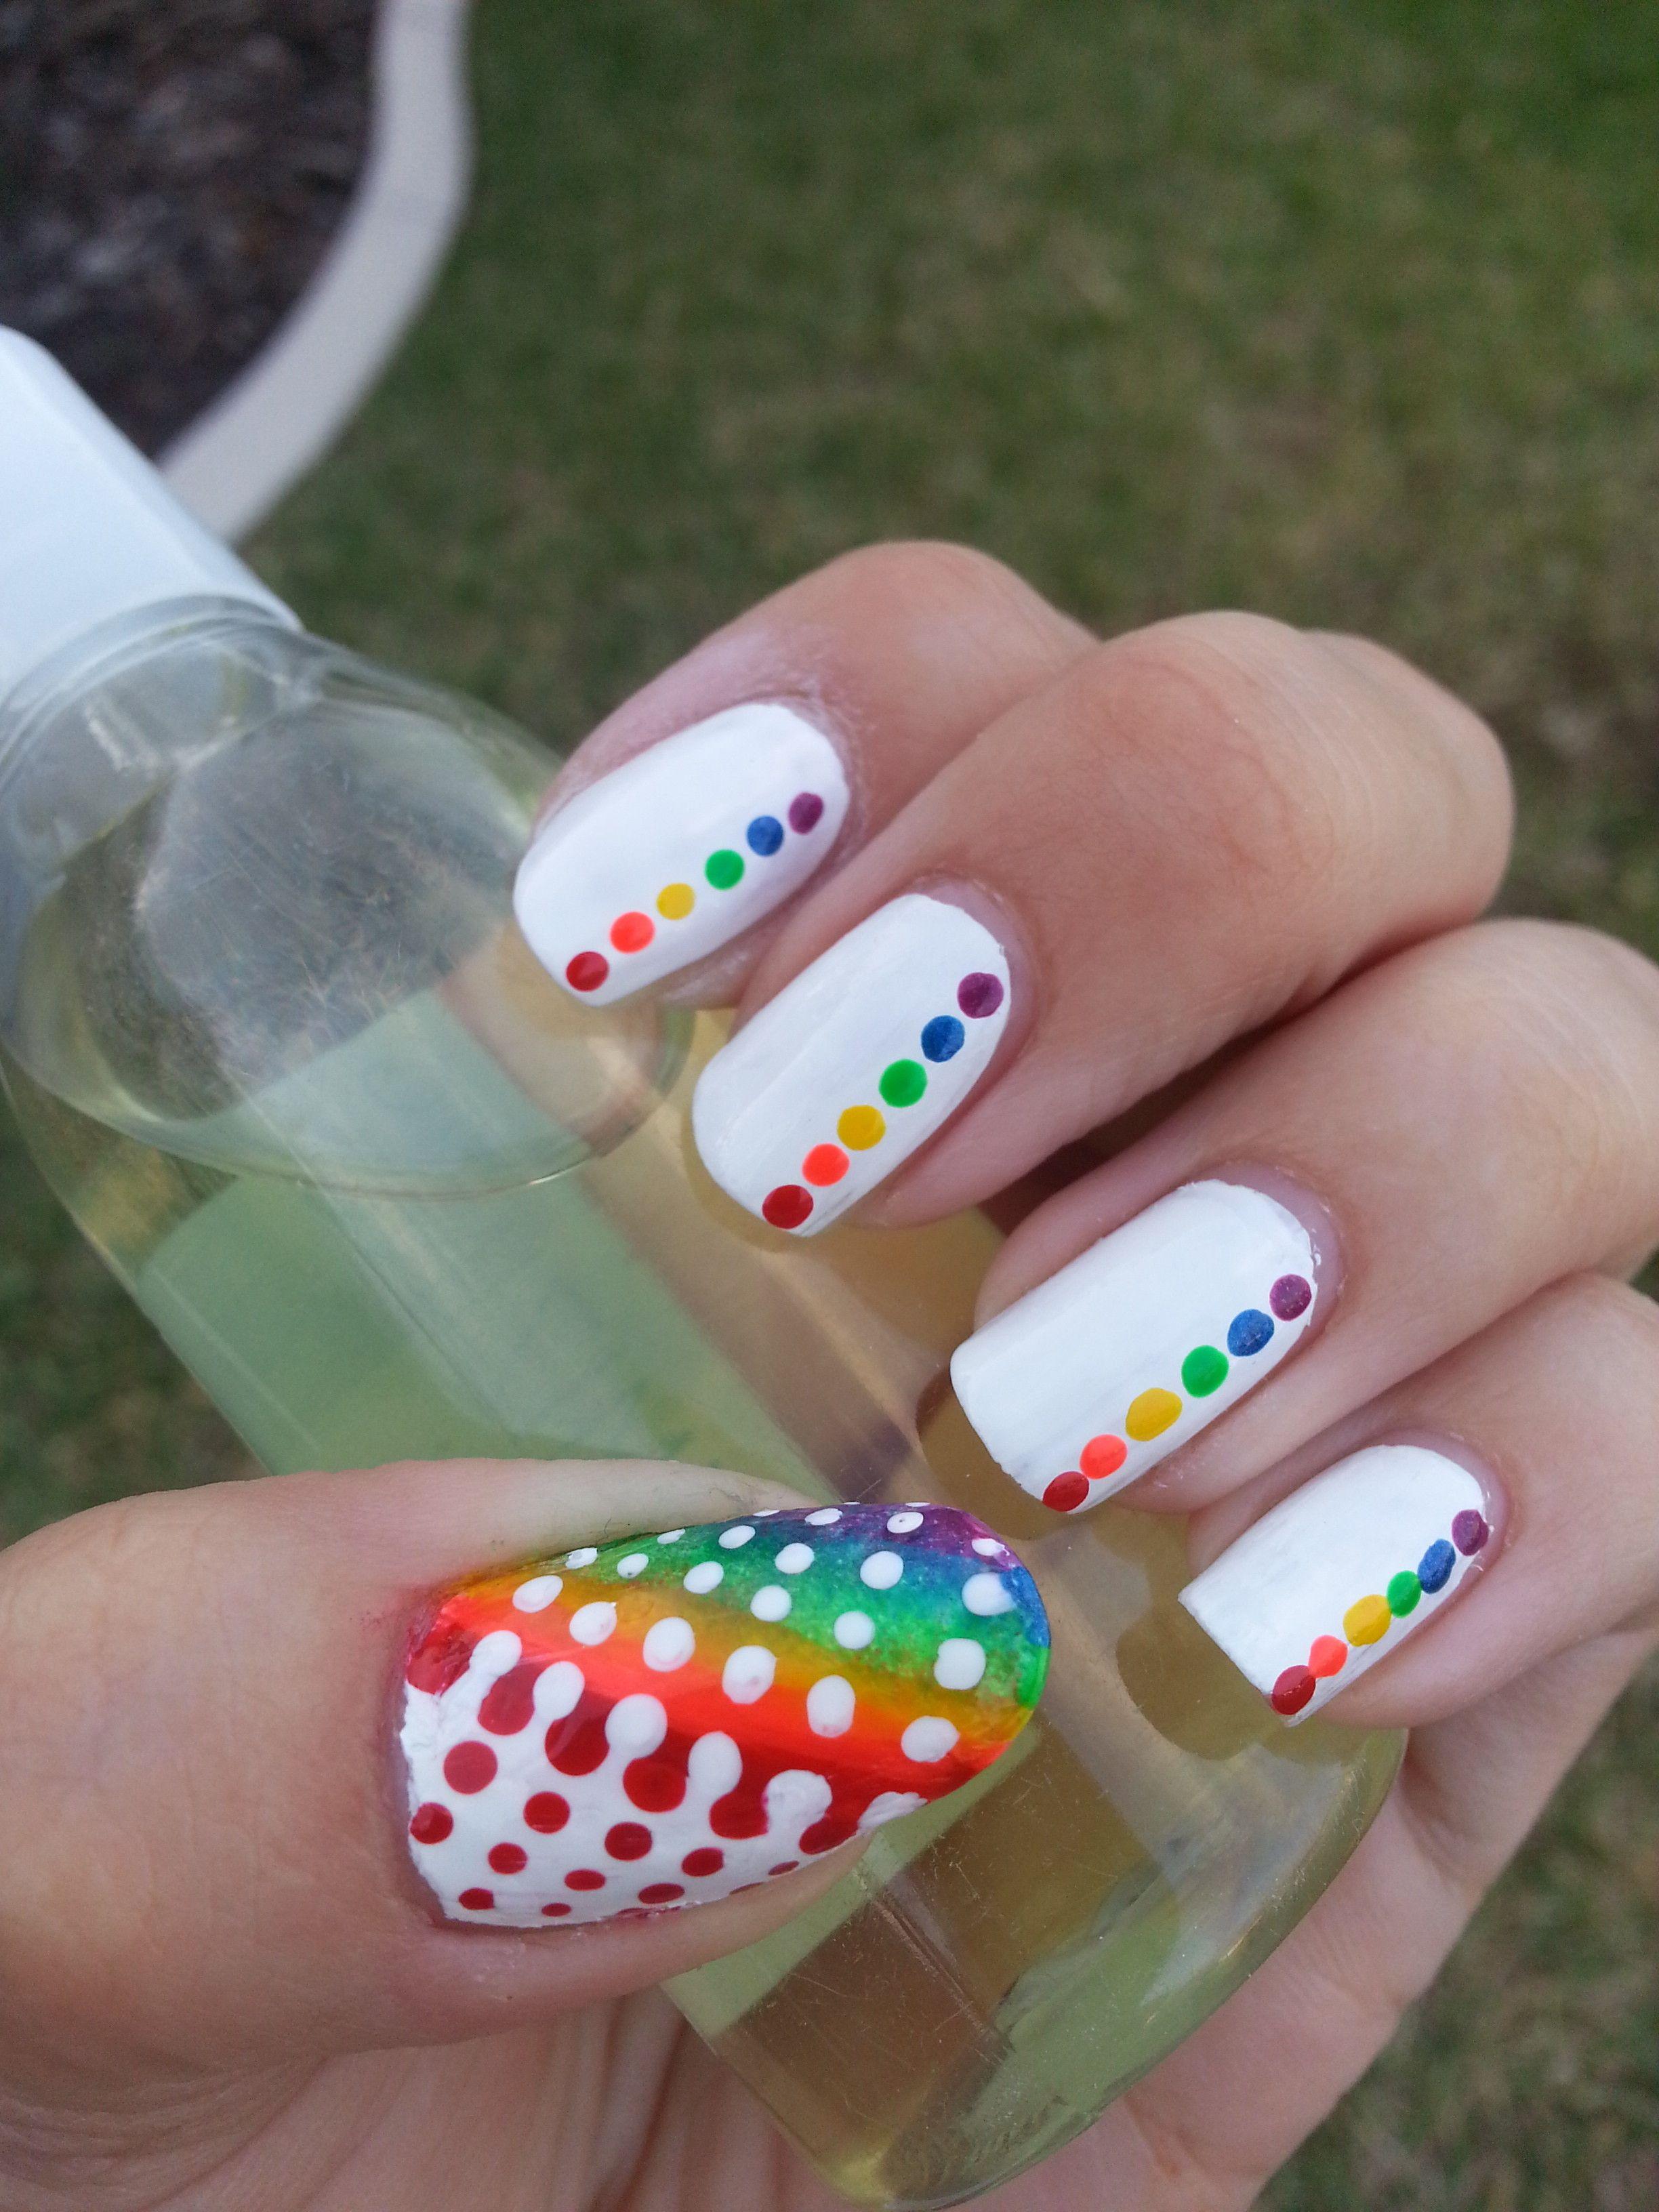 17 rainbow nail designs you wont miss rainbows makeup and beauty 17 rainbow nail designs you wont miss pretty designs solutioingenieria Gallery